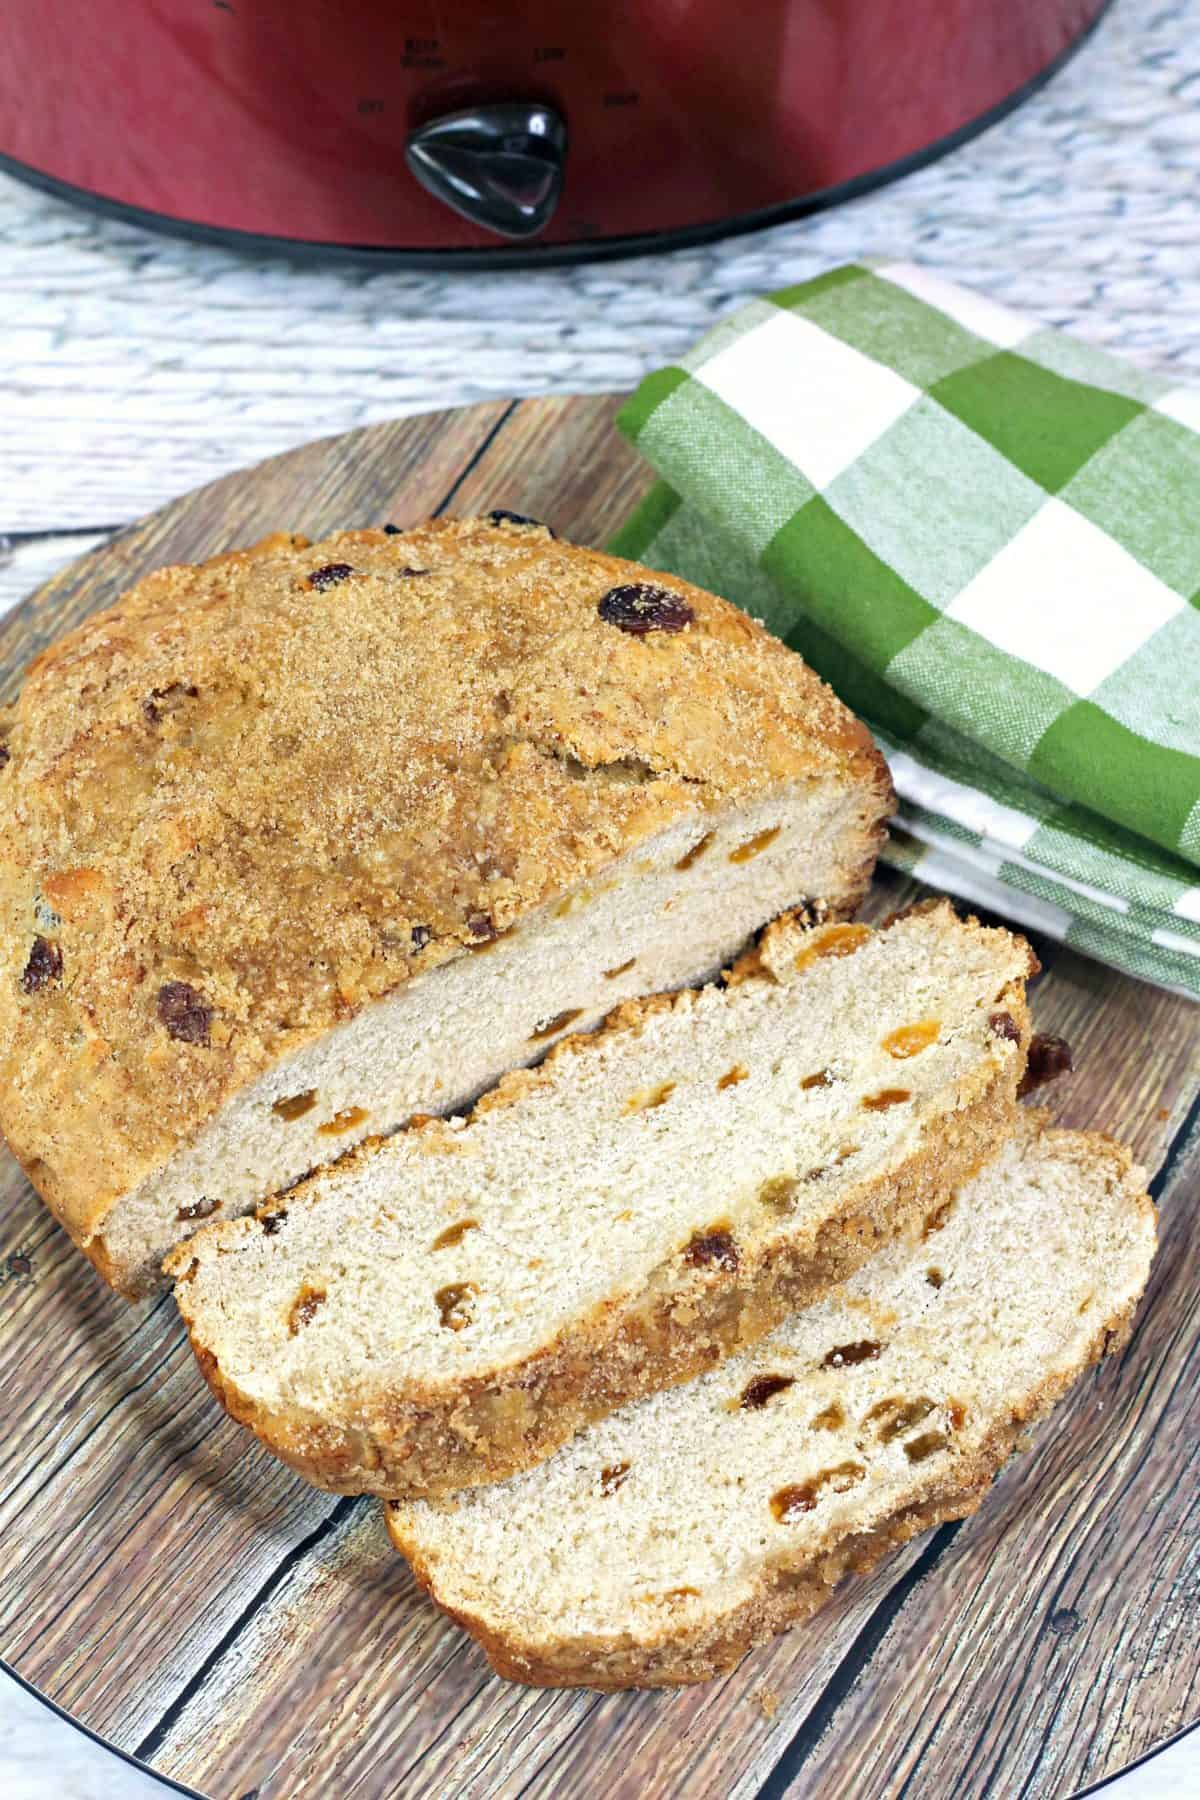 slow cooker quick bread, slow cooker cinnamon raisin bread